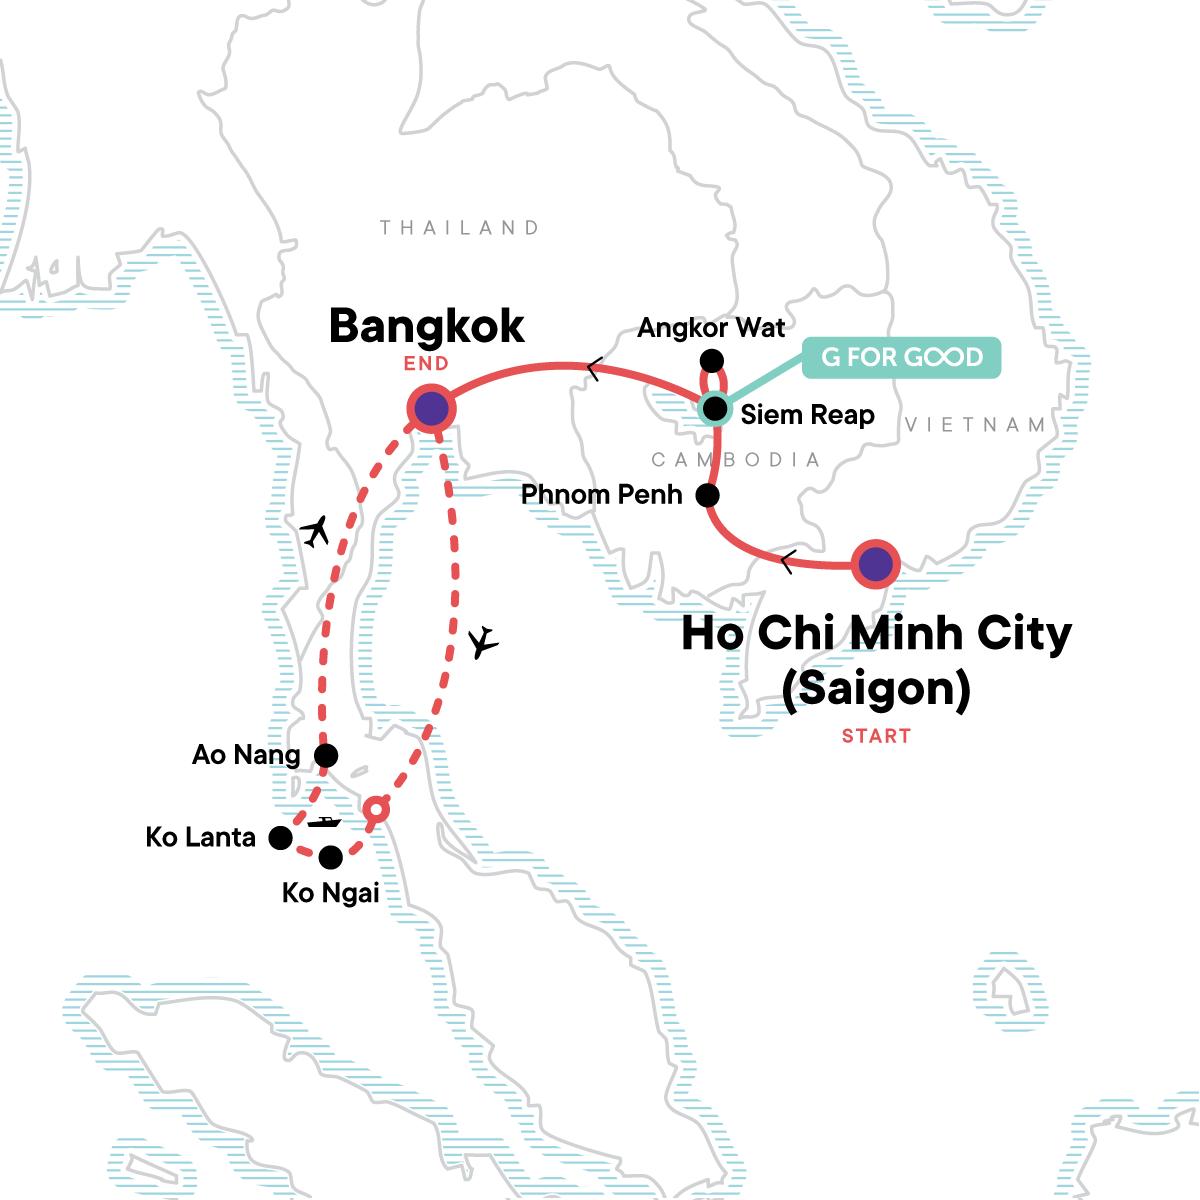 Classic Cambodia and Thai Islands – West Coast Map